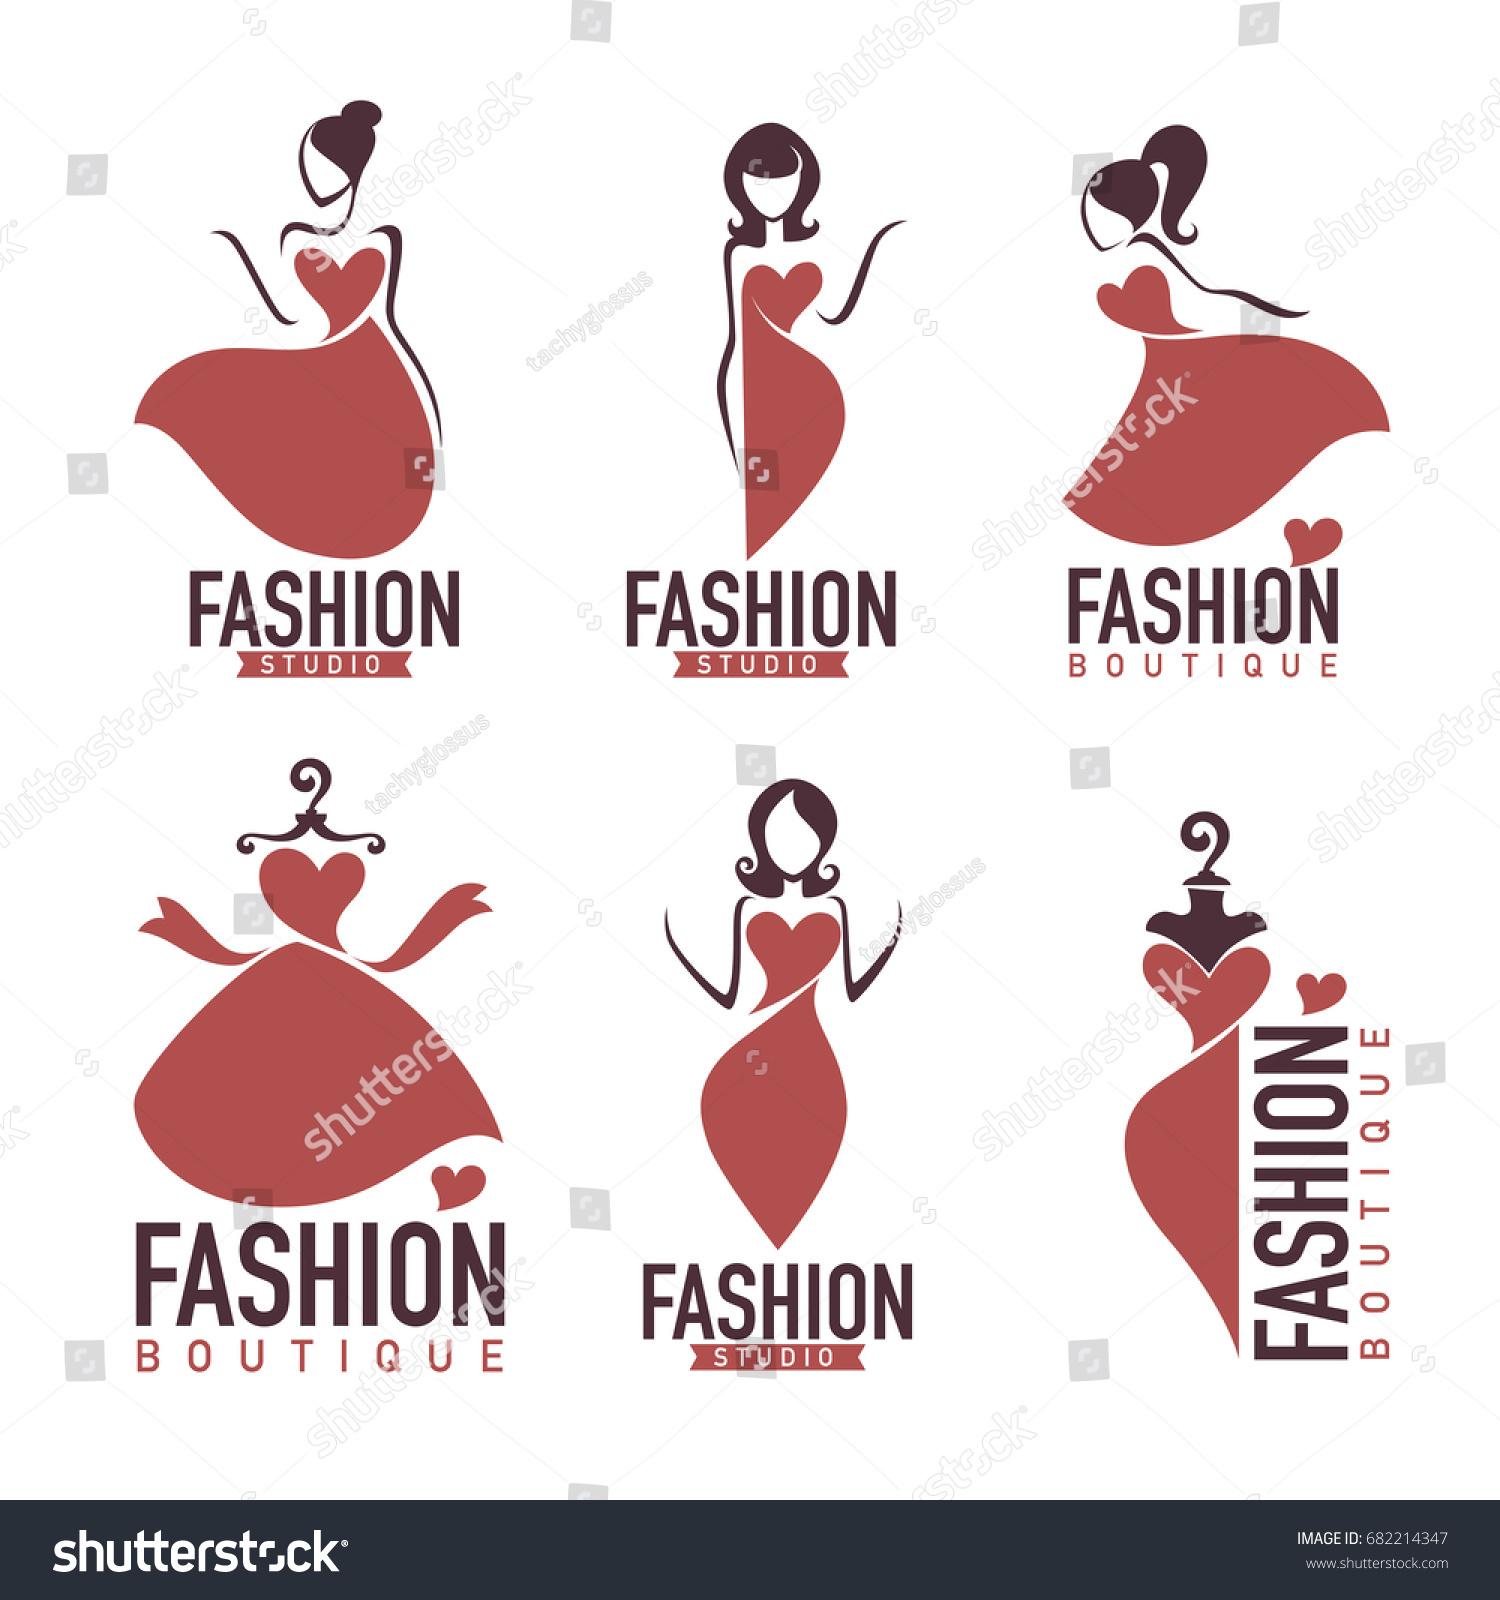 Fashion beauty salon studio boutique logo stock vector for 560 salon grand junction